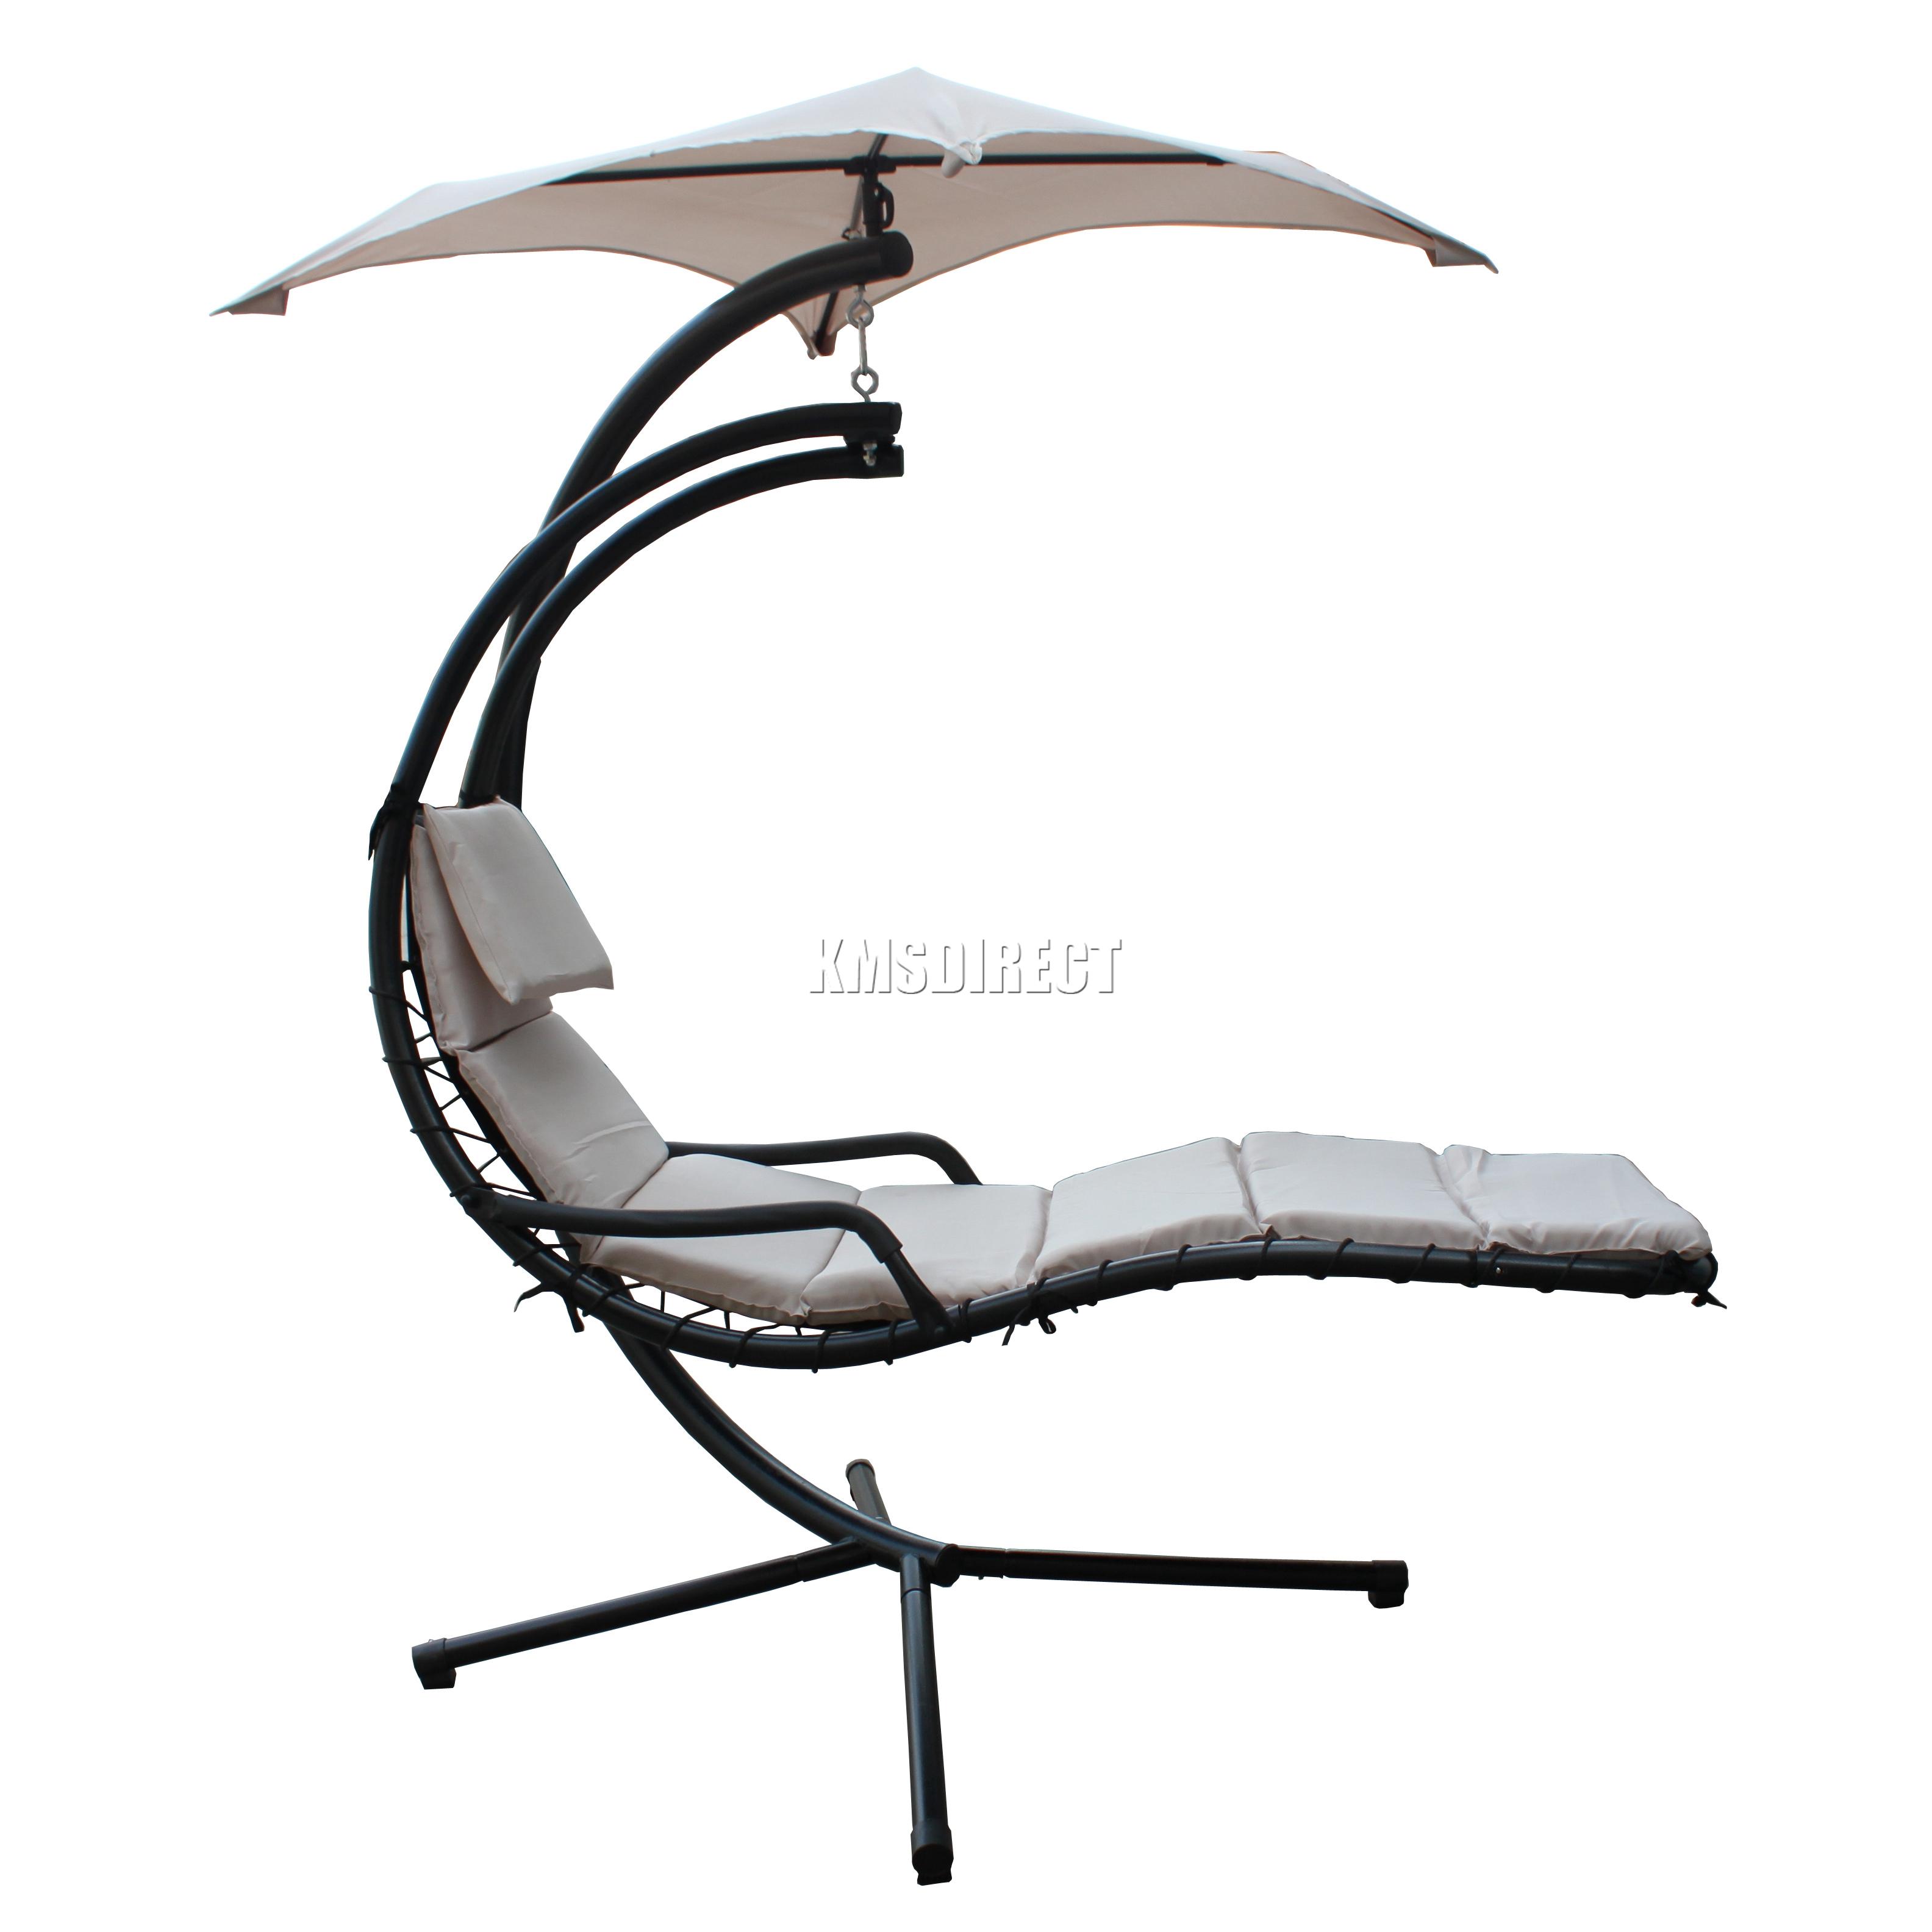 sentinel foxhunter garden beige helicopter hanging dream chair swing hammock sun lounger foxhunter garden beige helicopter hanging dream chair swing      rh   ebay co uk